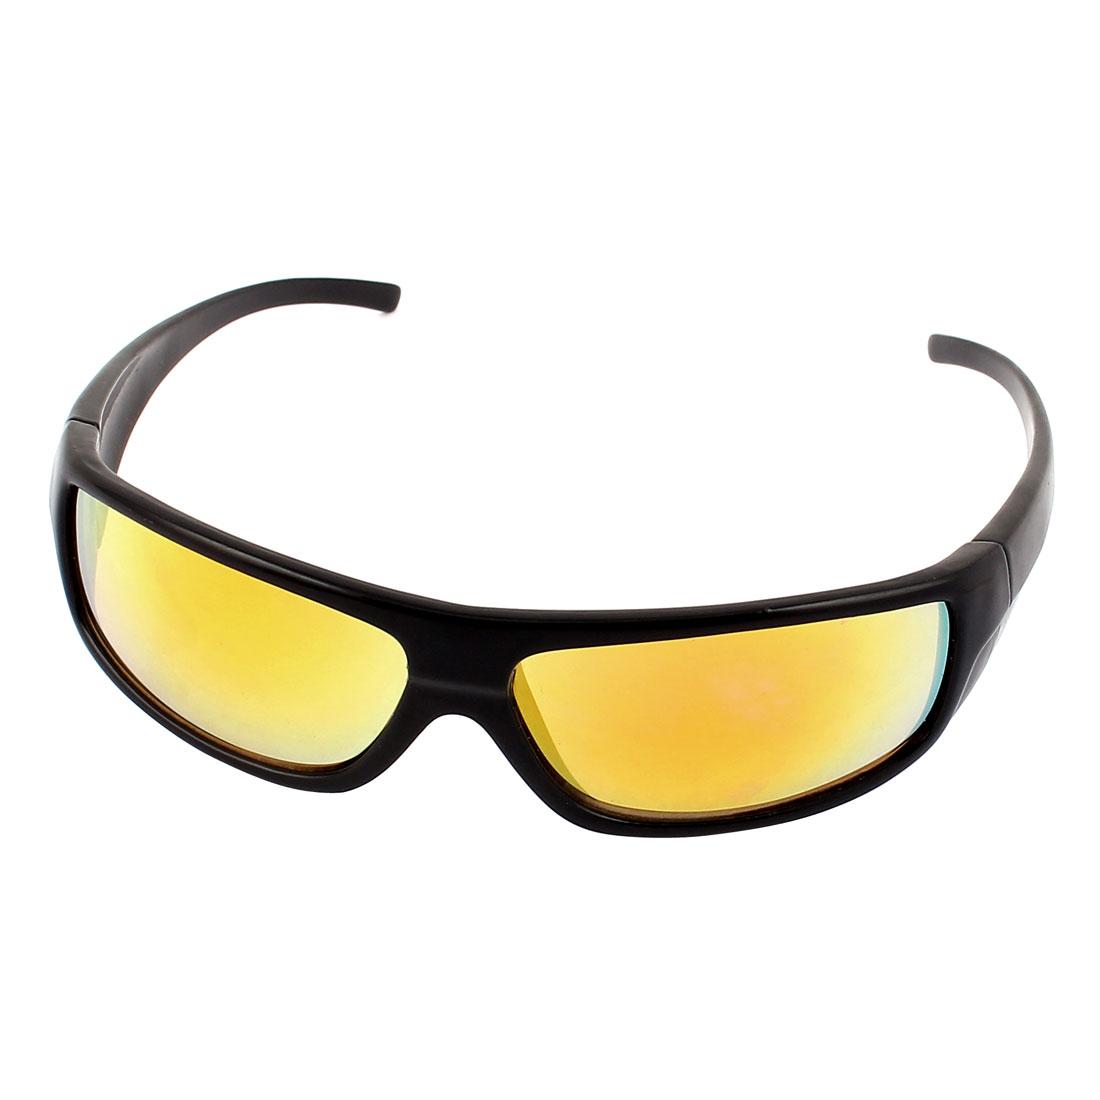 Men Outdoor Driving Full Rim Sunglasses Mirrored Eyeglasses Eyewear